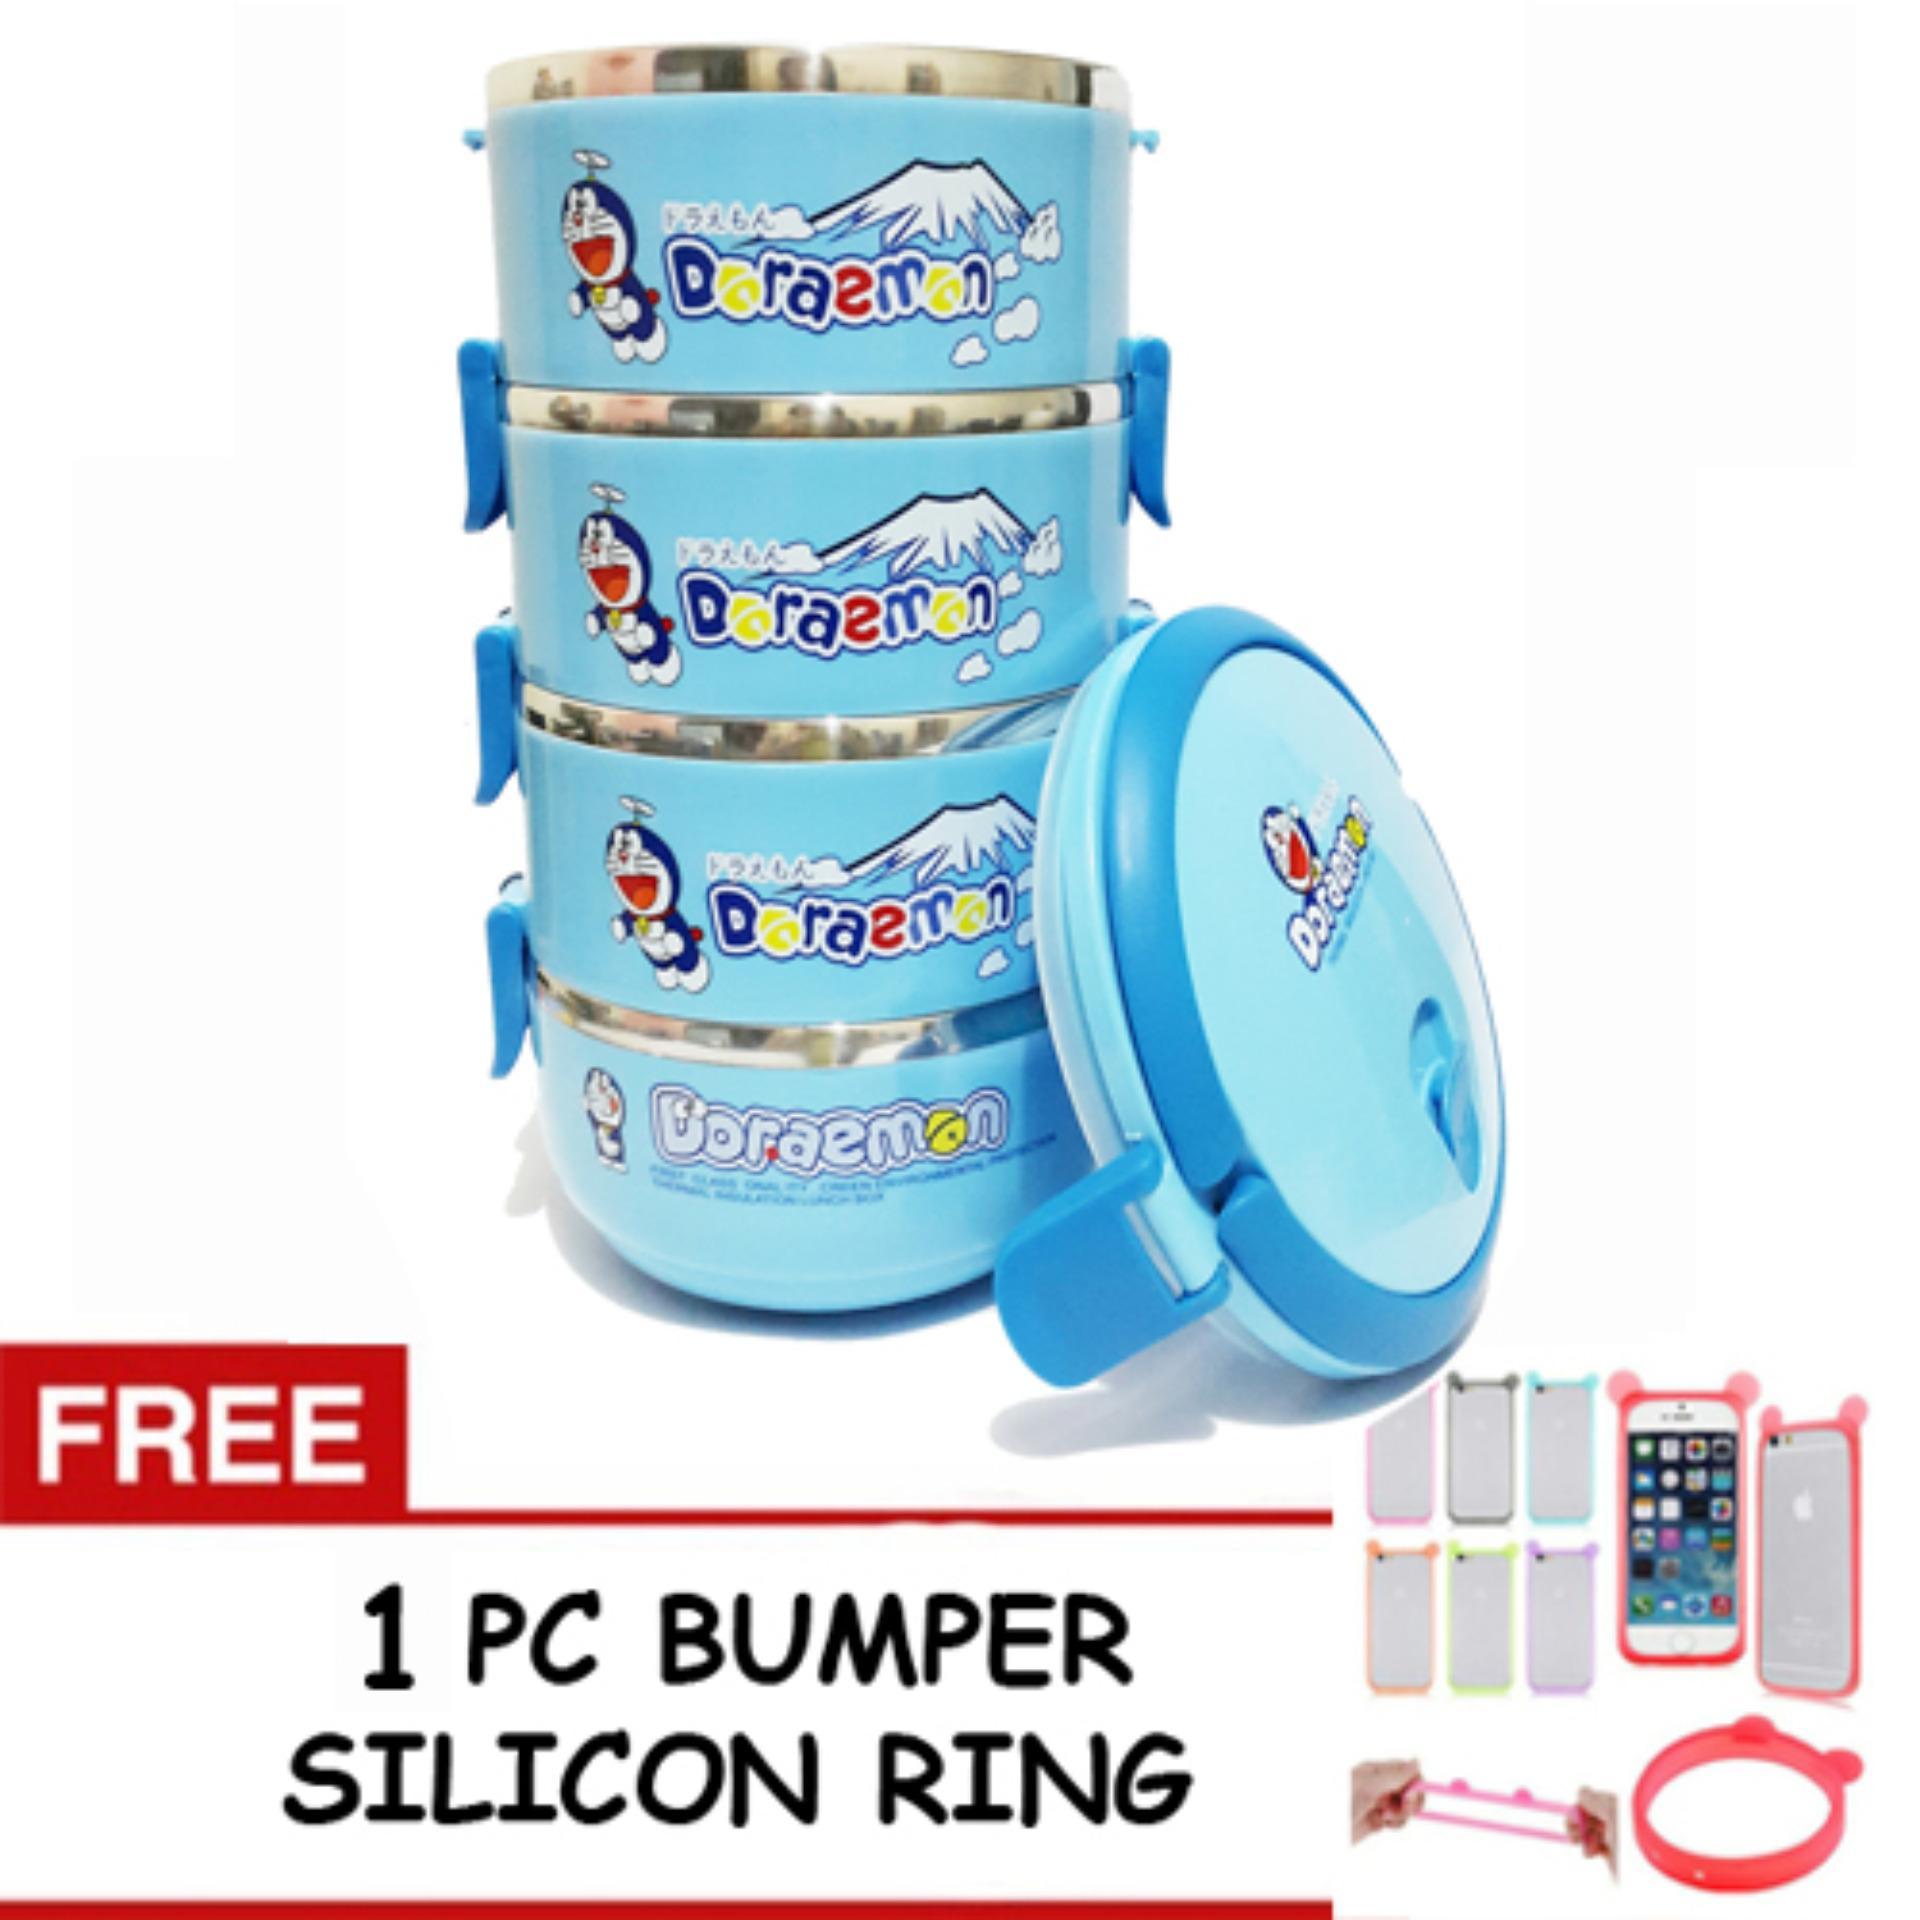 Beli Oem Rantang Lunch Box Stainless Karakter 4 Susun Free 1 Pc Bumper Silikon Pelindung Handphone Online Murah